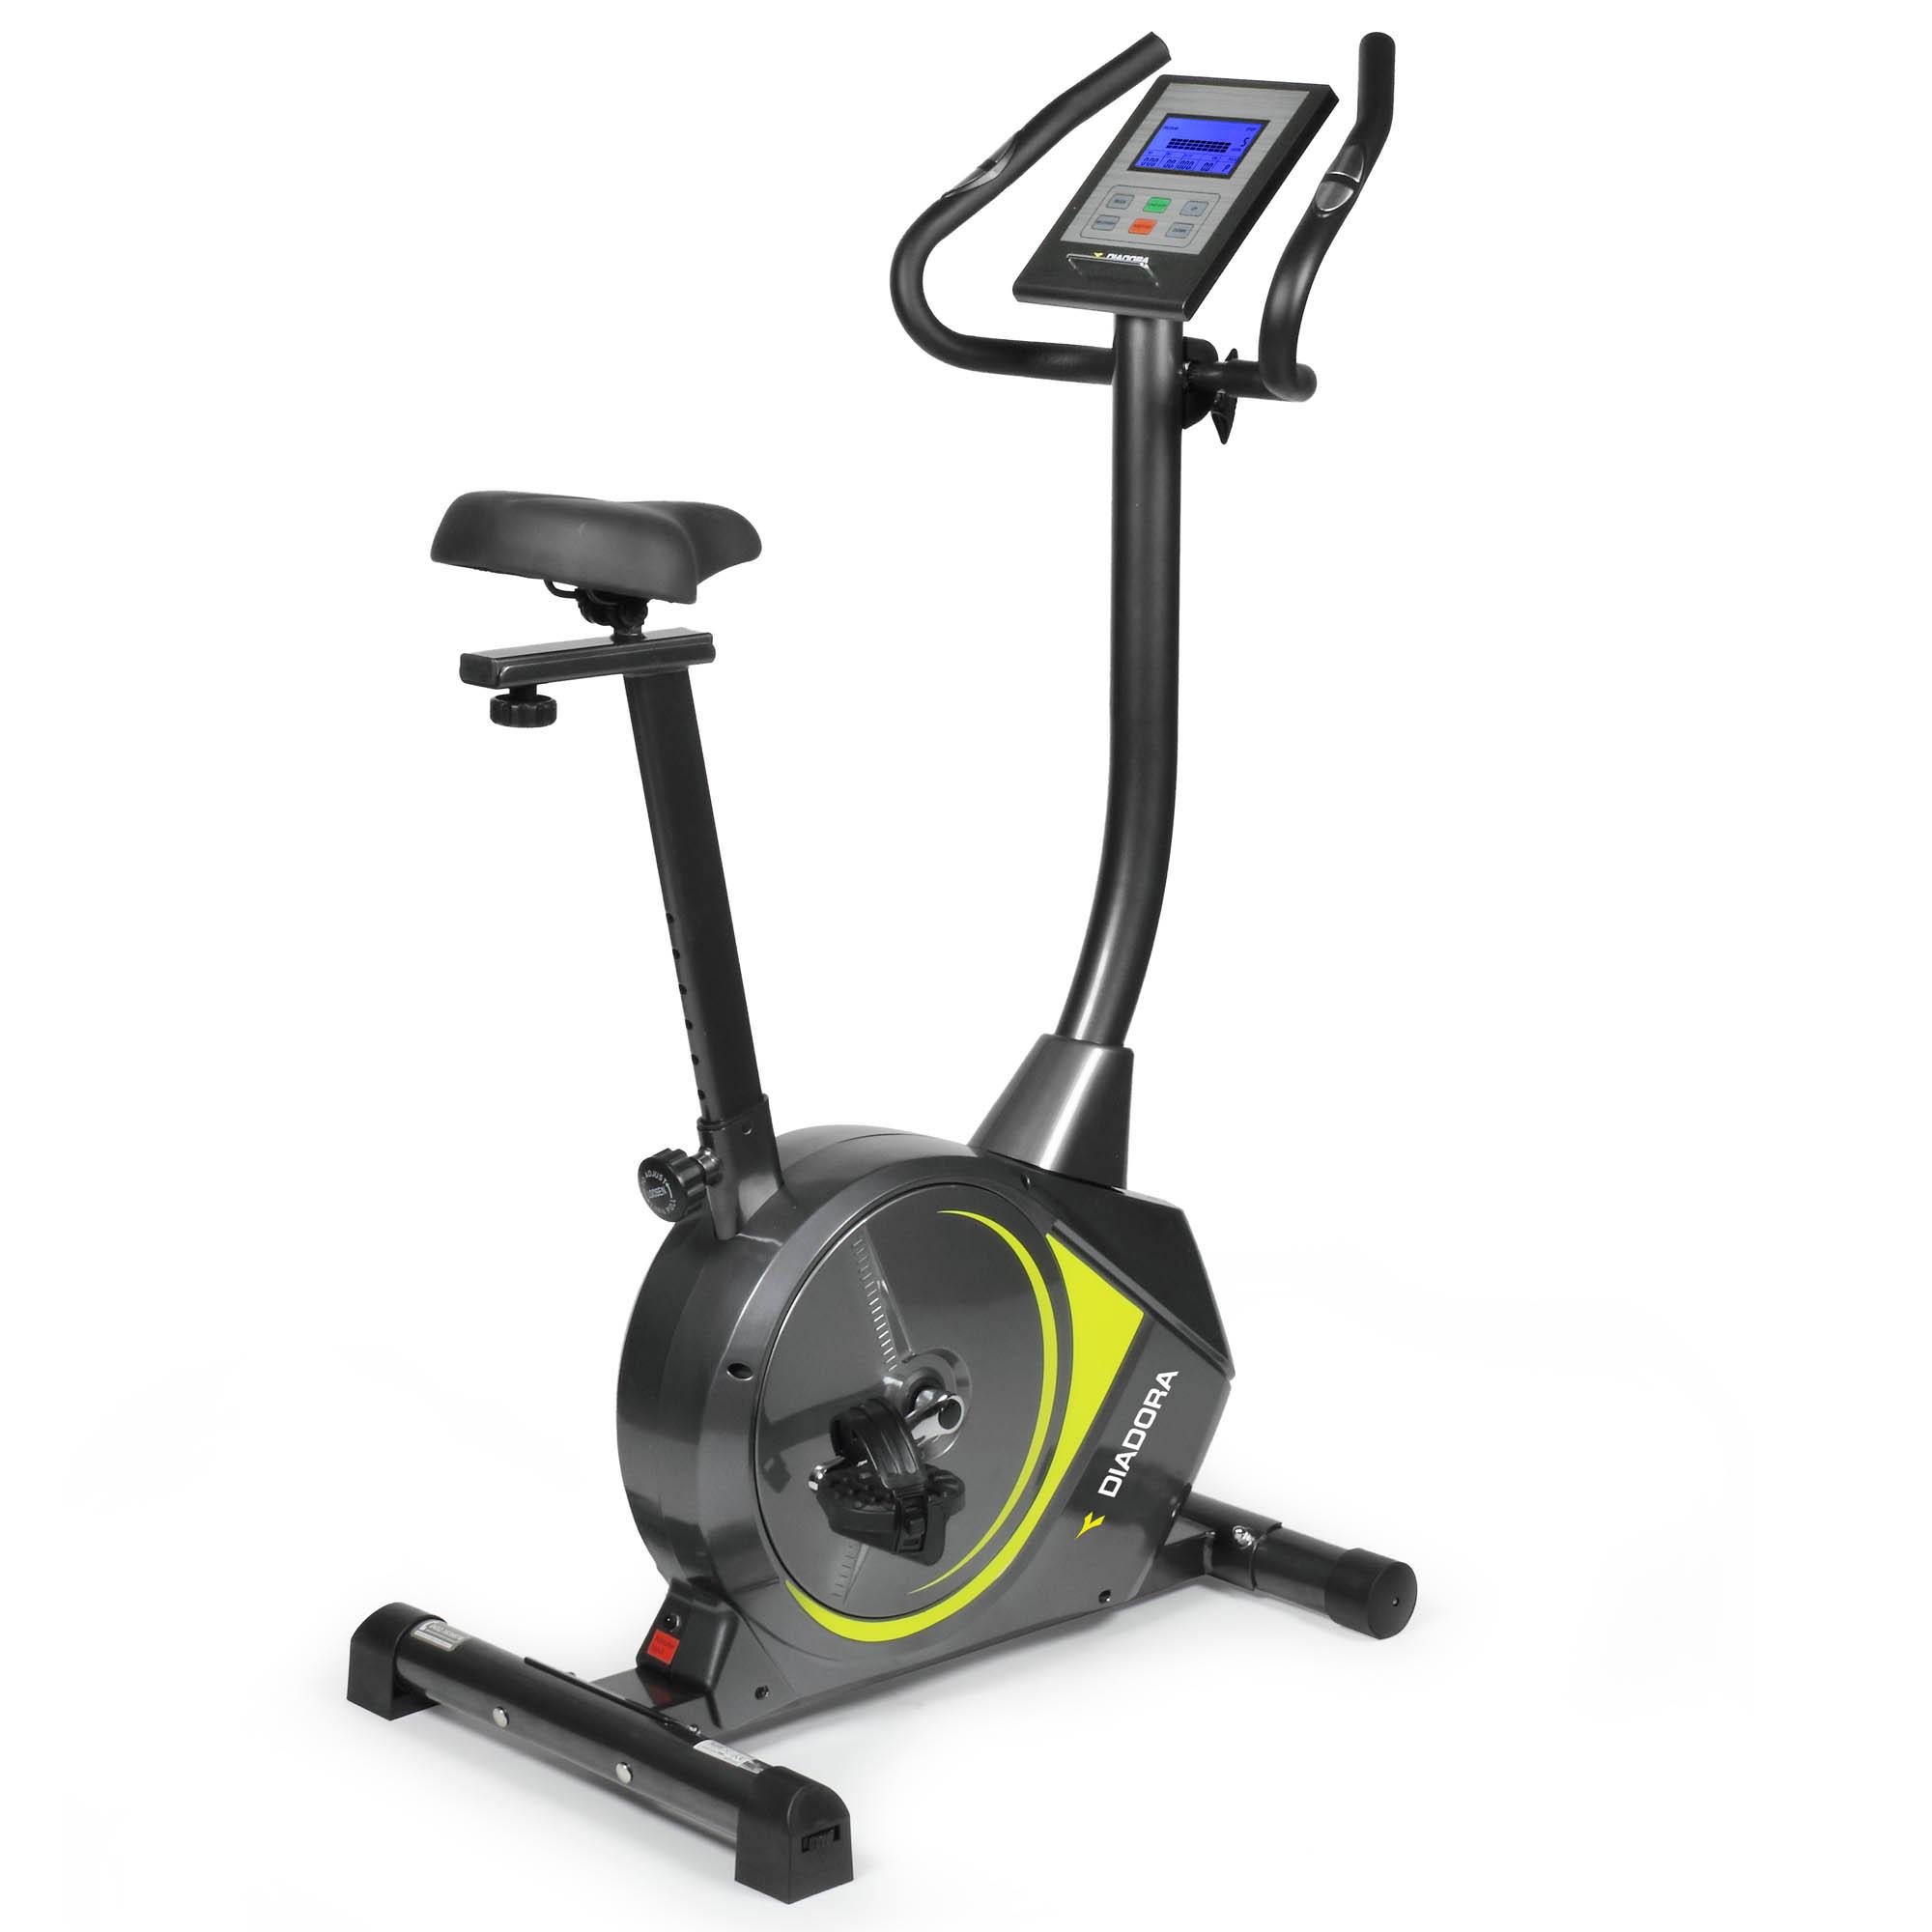 Cyclette DiadoraFitness